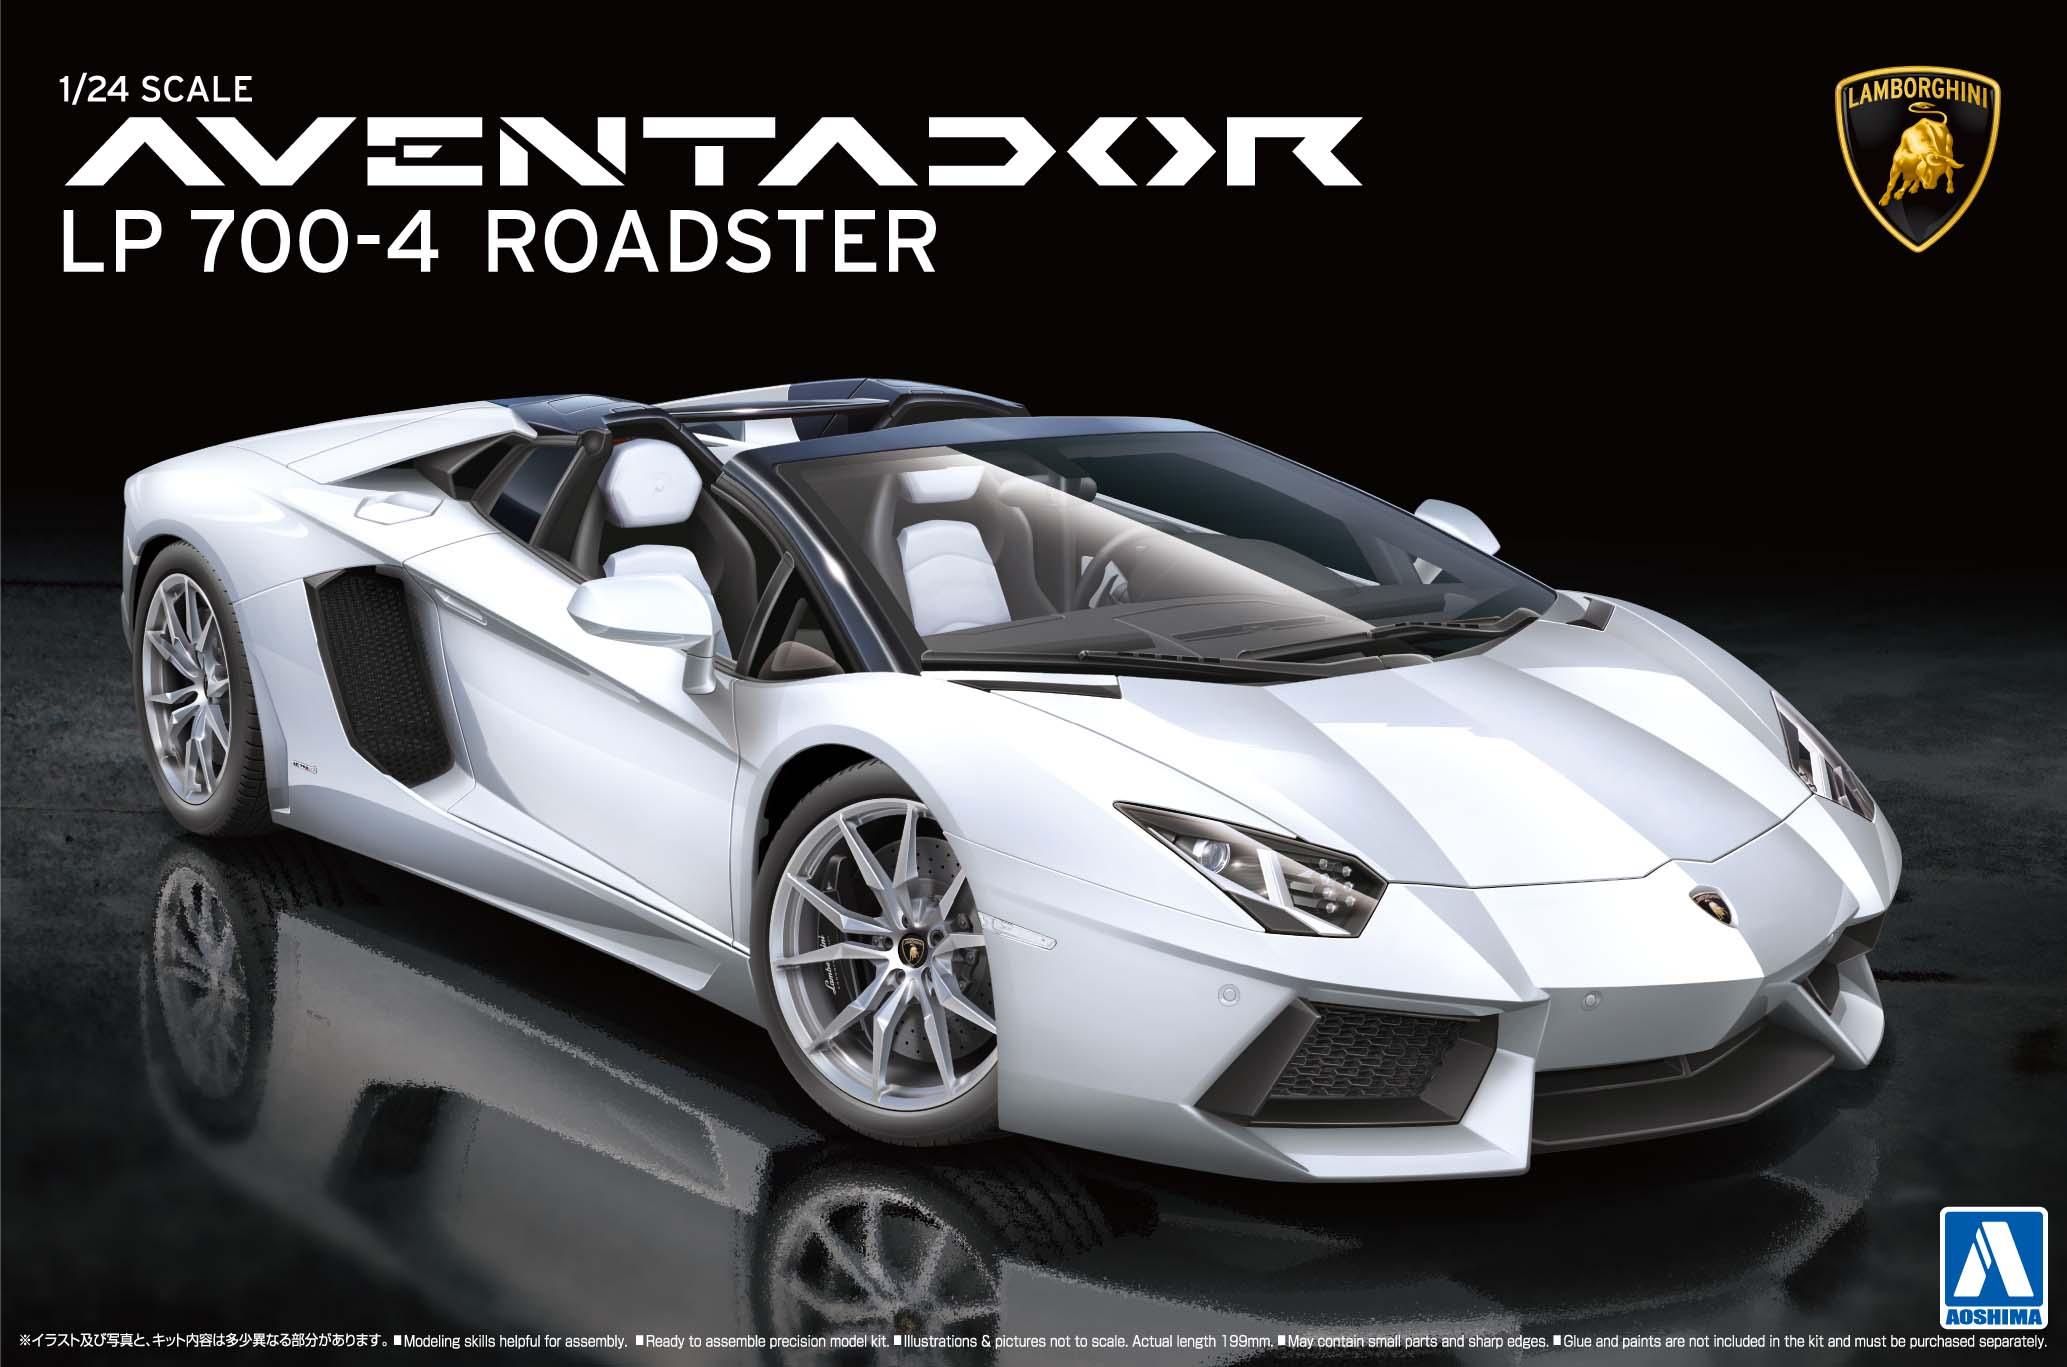 Lamborghini Aventador Roadster Price >> 1:24 Lamborghini Aventador LP 700-4 Roadster   AOS-008652   Aoshima